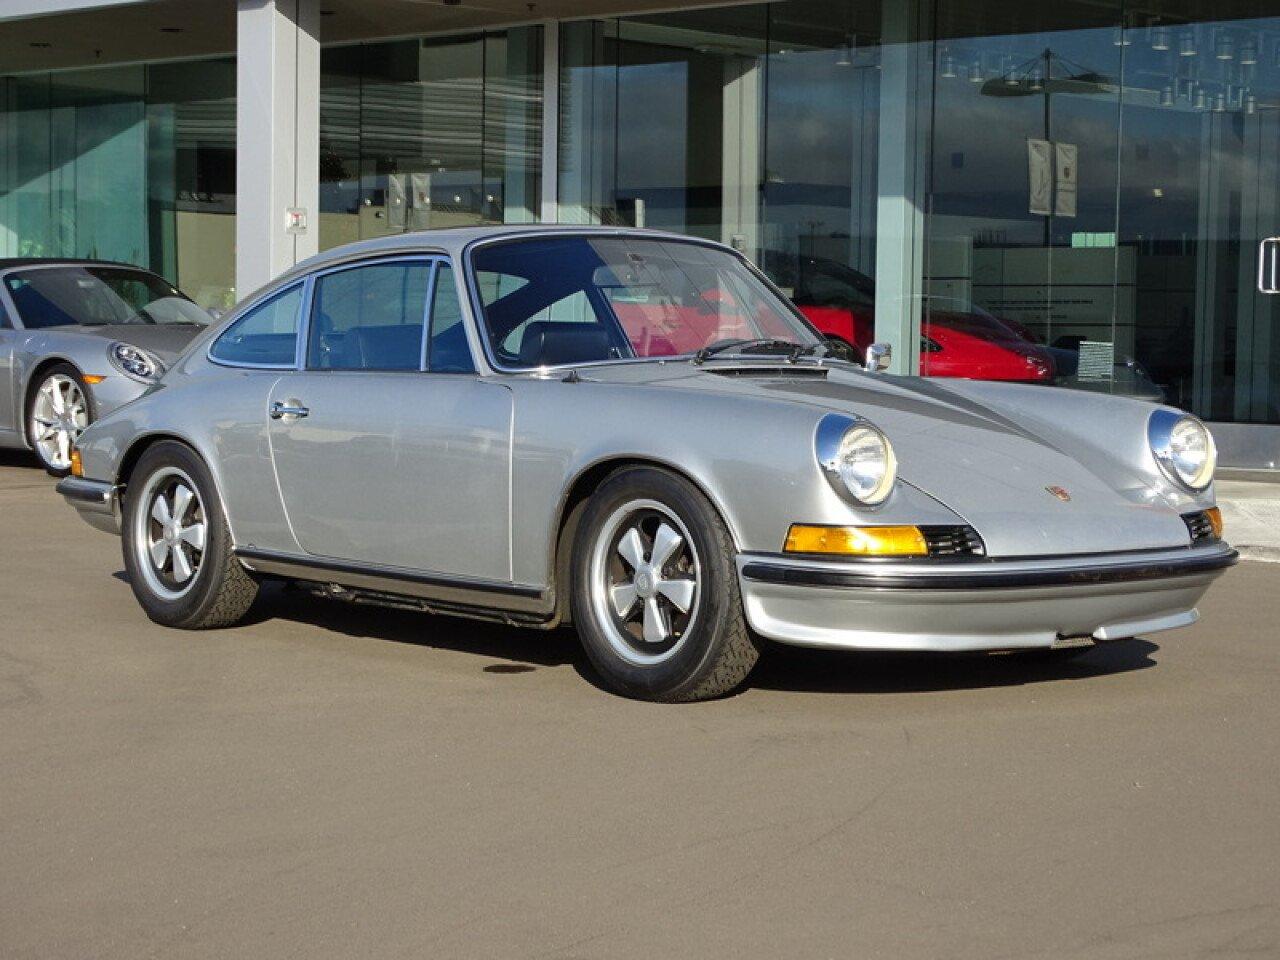 Cars For Sale San Diego >> 1973 Porsche 911 for sale near San Diego, California 92126 - Classics on Autotrader